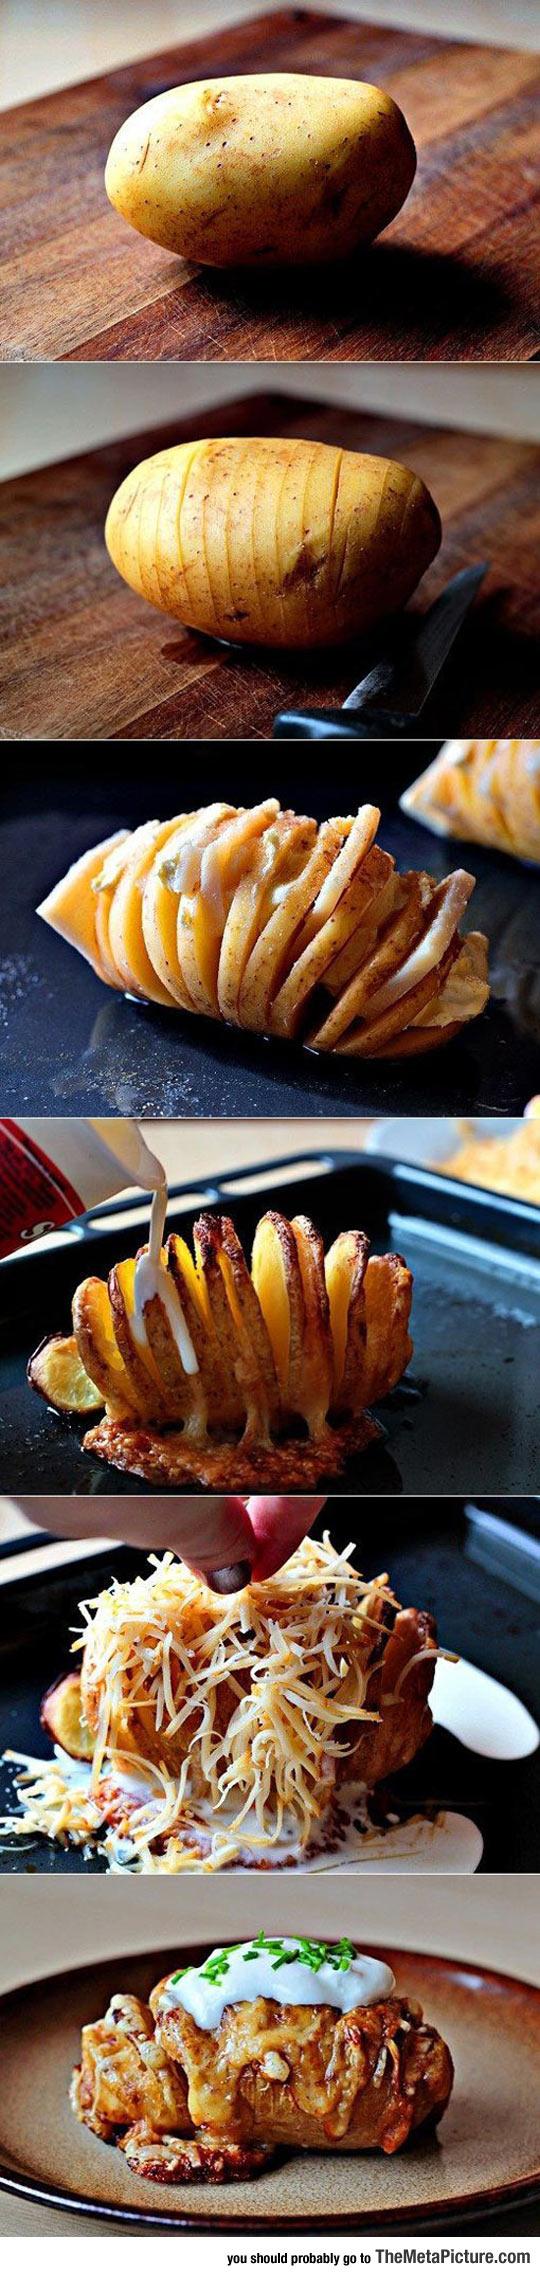 cool-tasty-cheese-potato-crispy-food-idea